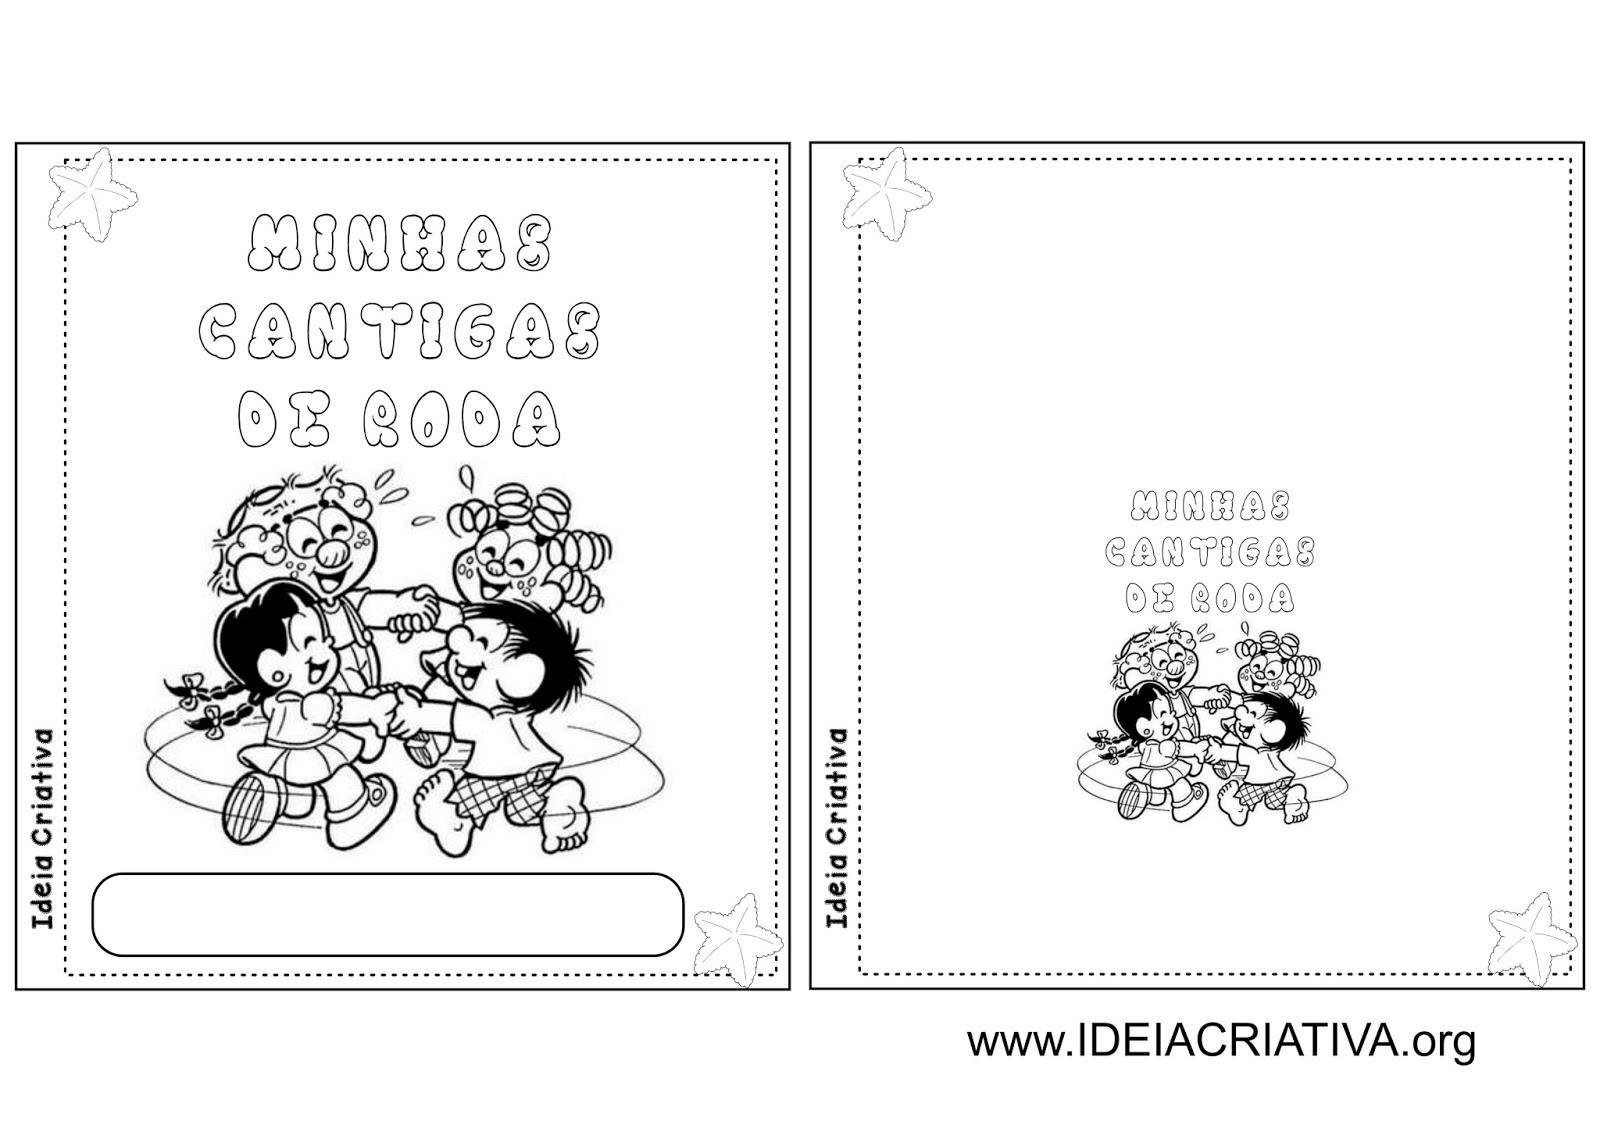 Populares Álbum Ilustrado Cantigas de Roda Folclore | Ideia Criativa - Gi  MG09